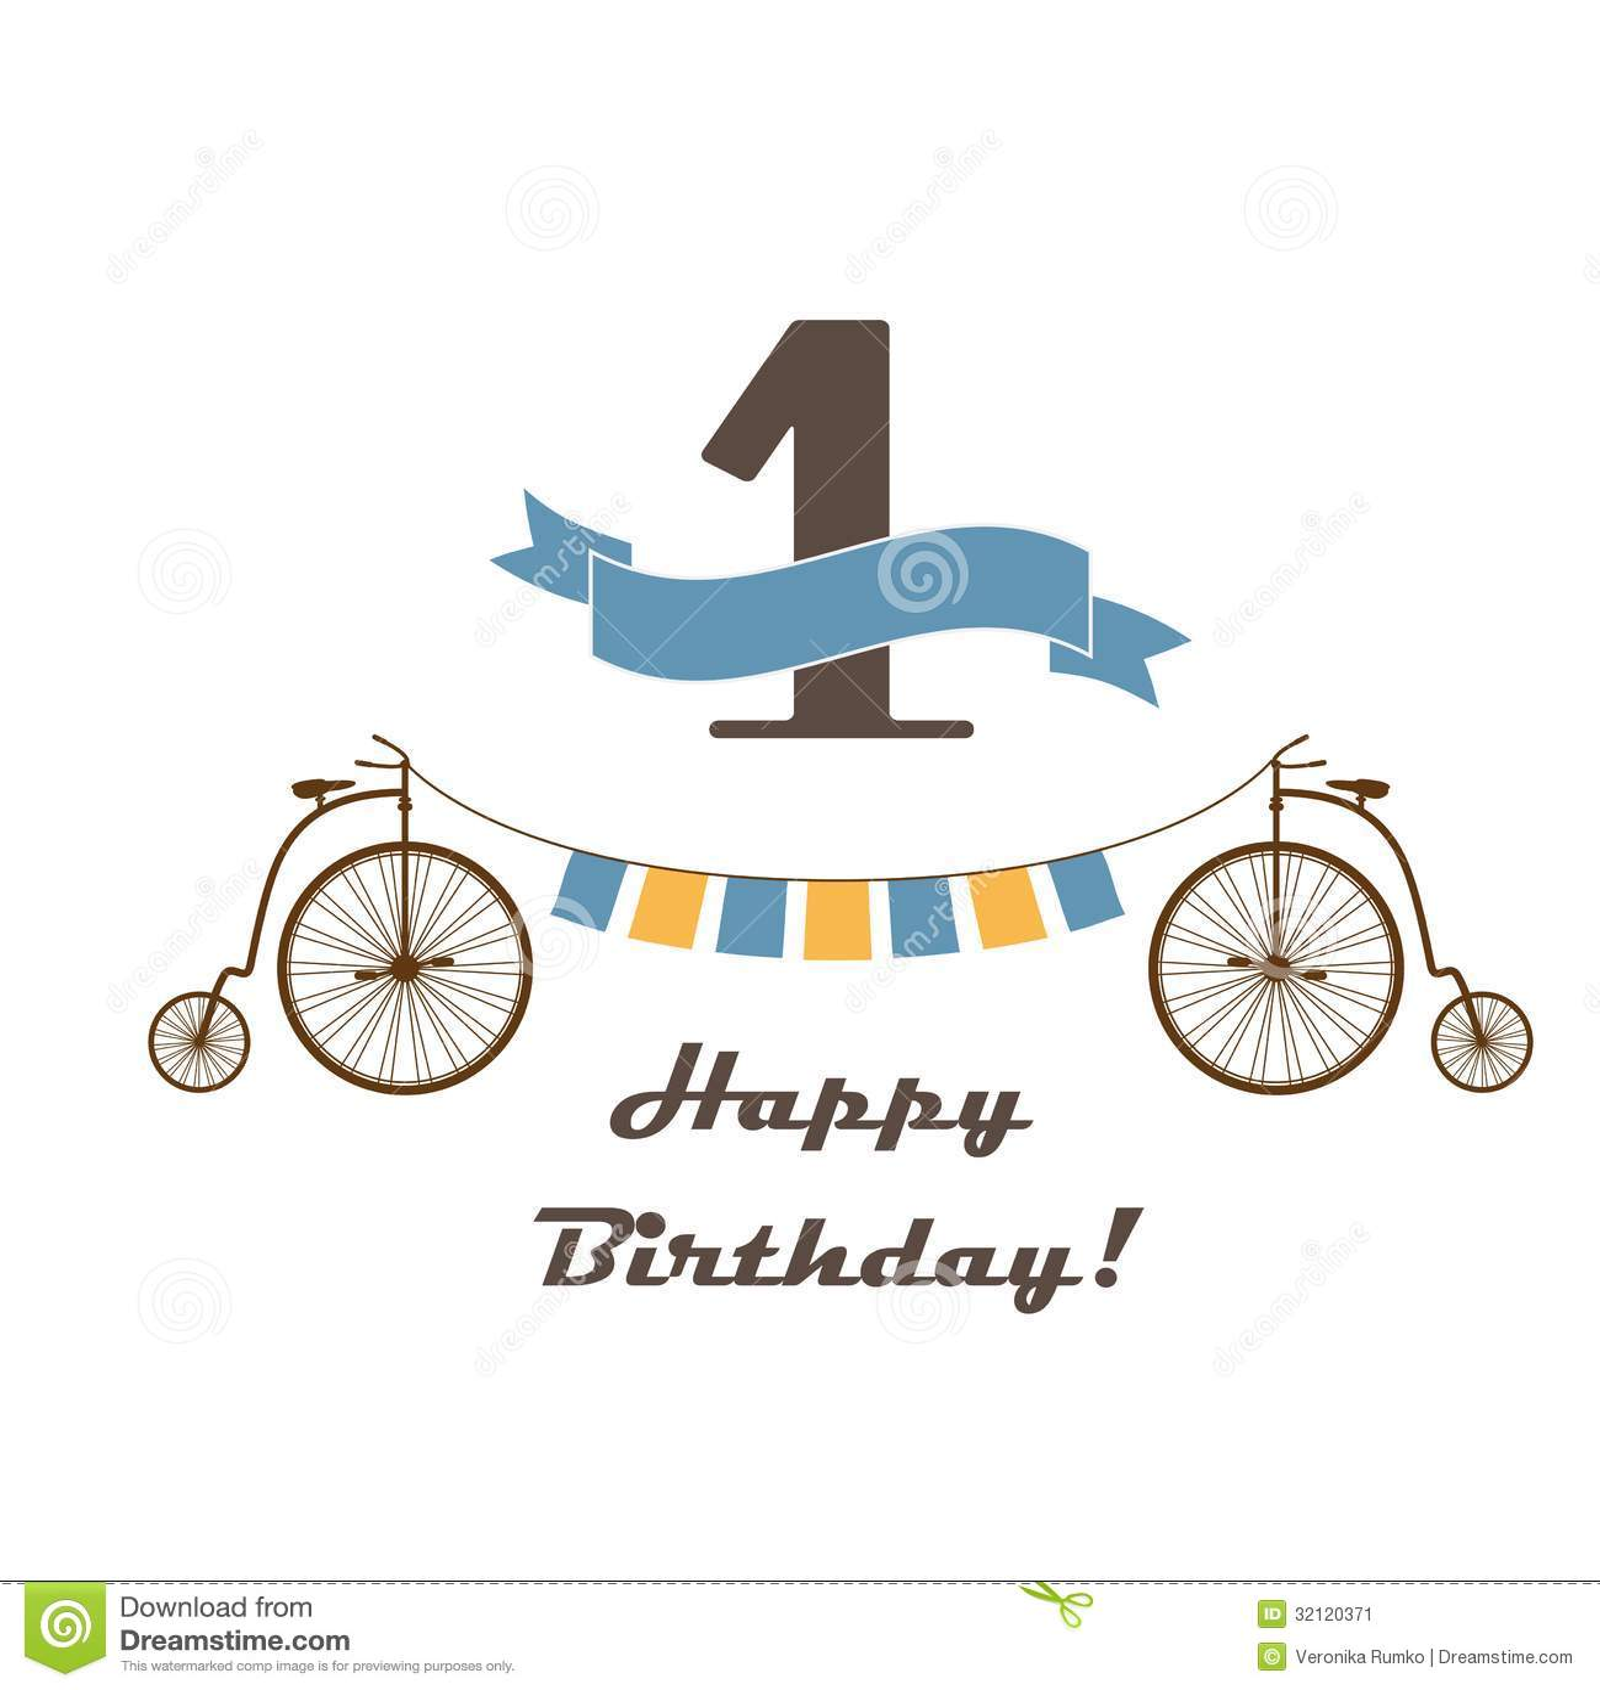 Happy Birthday Card For 1st Birthday Illustration Image – Happy 1st Birthday Card